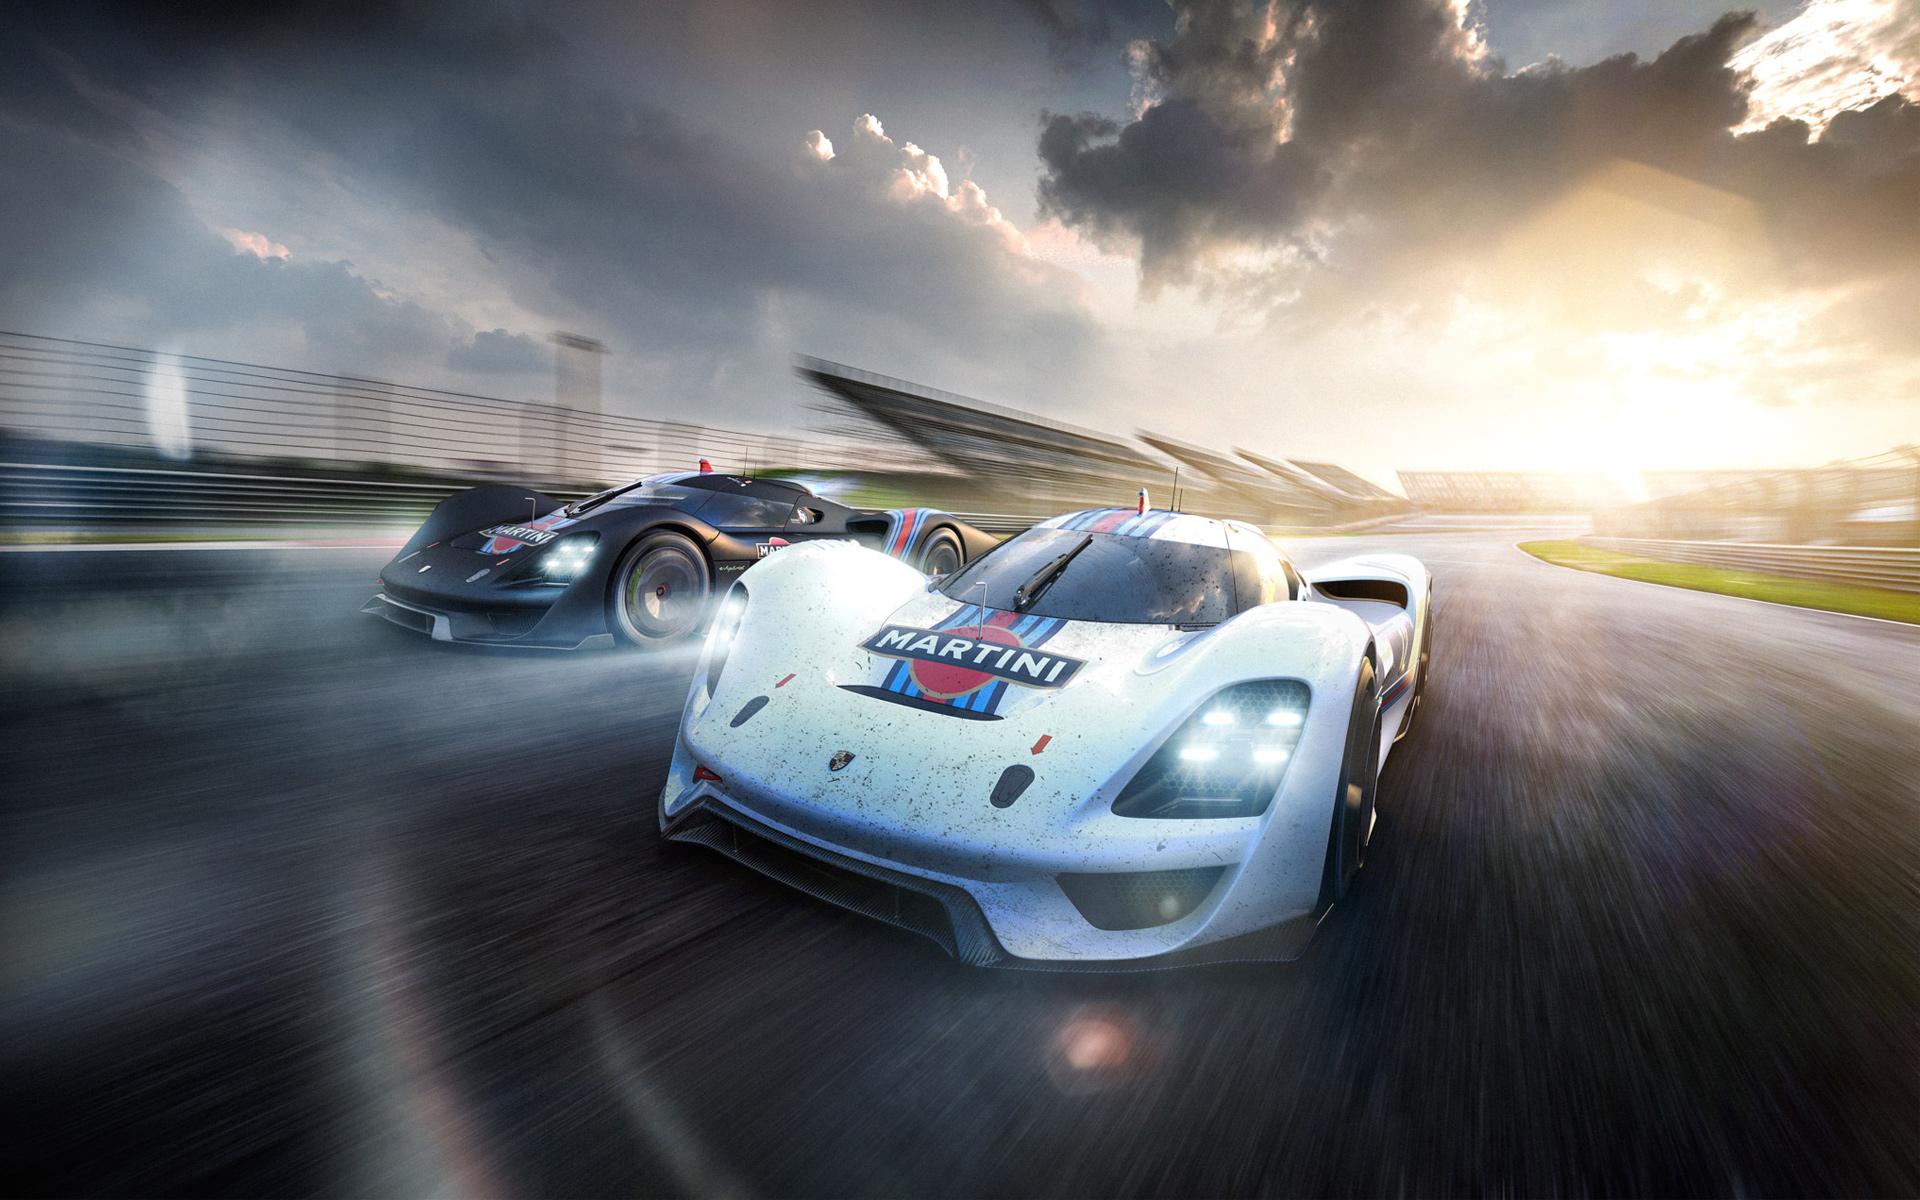 Race Car Wallpaper For Iphone Porsche Vision Gt Concept 2016 Wallpaper Hd Car